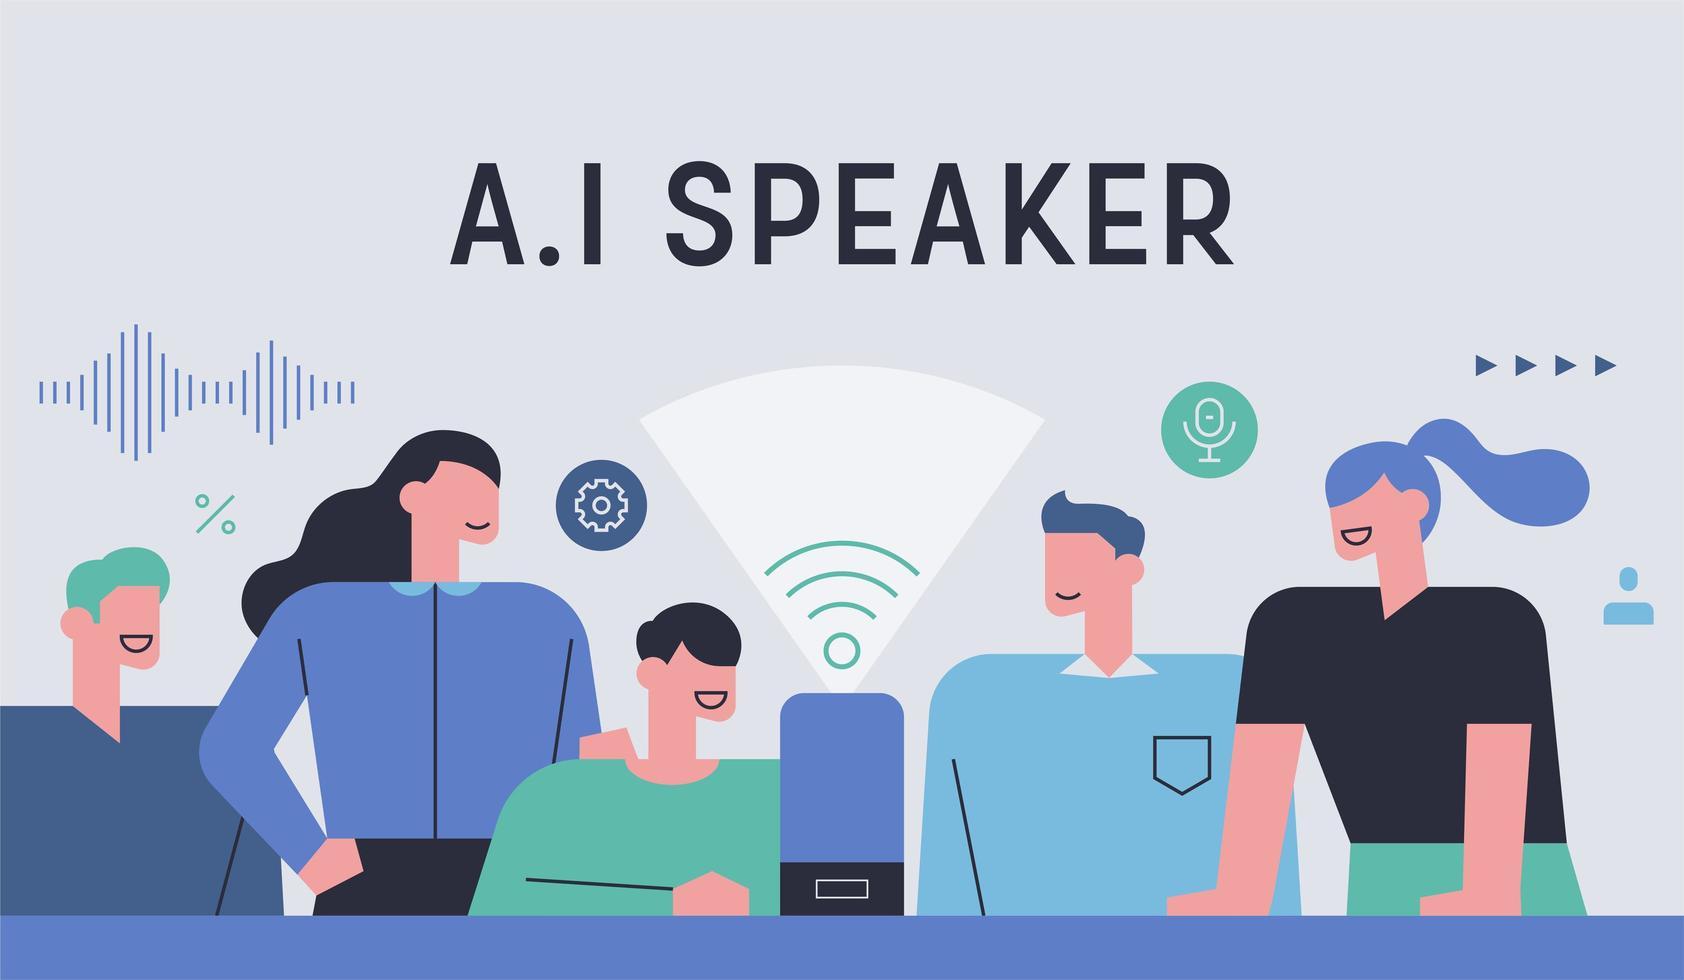 alto-falante AI e estilo de vida vetor